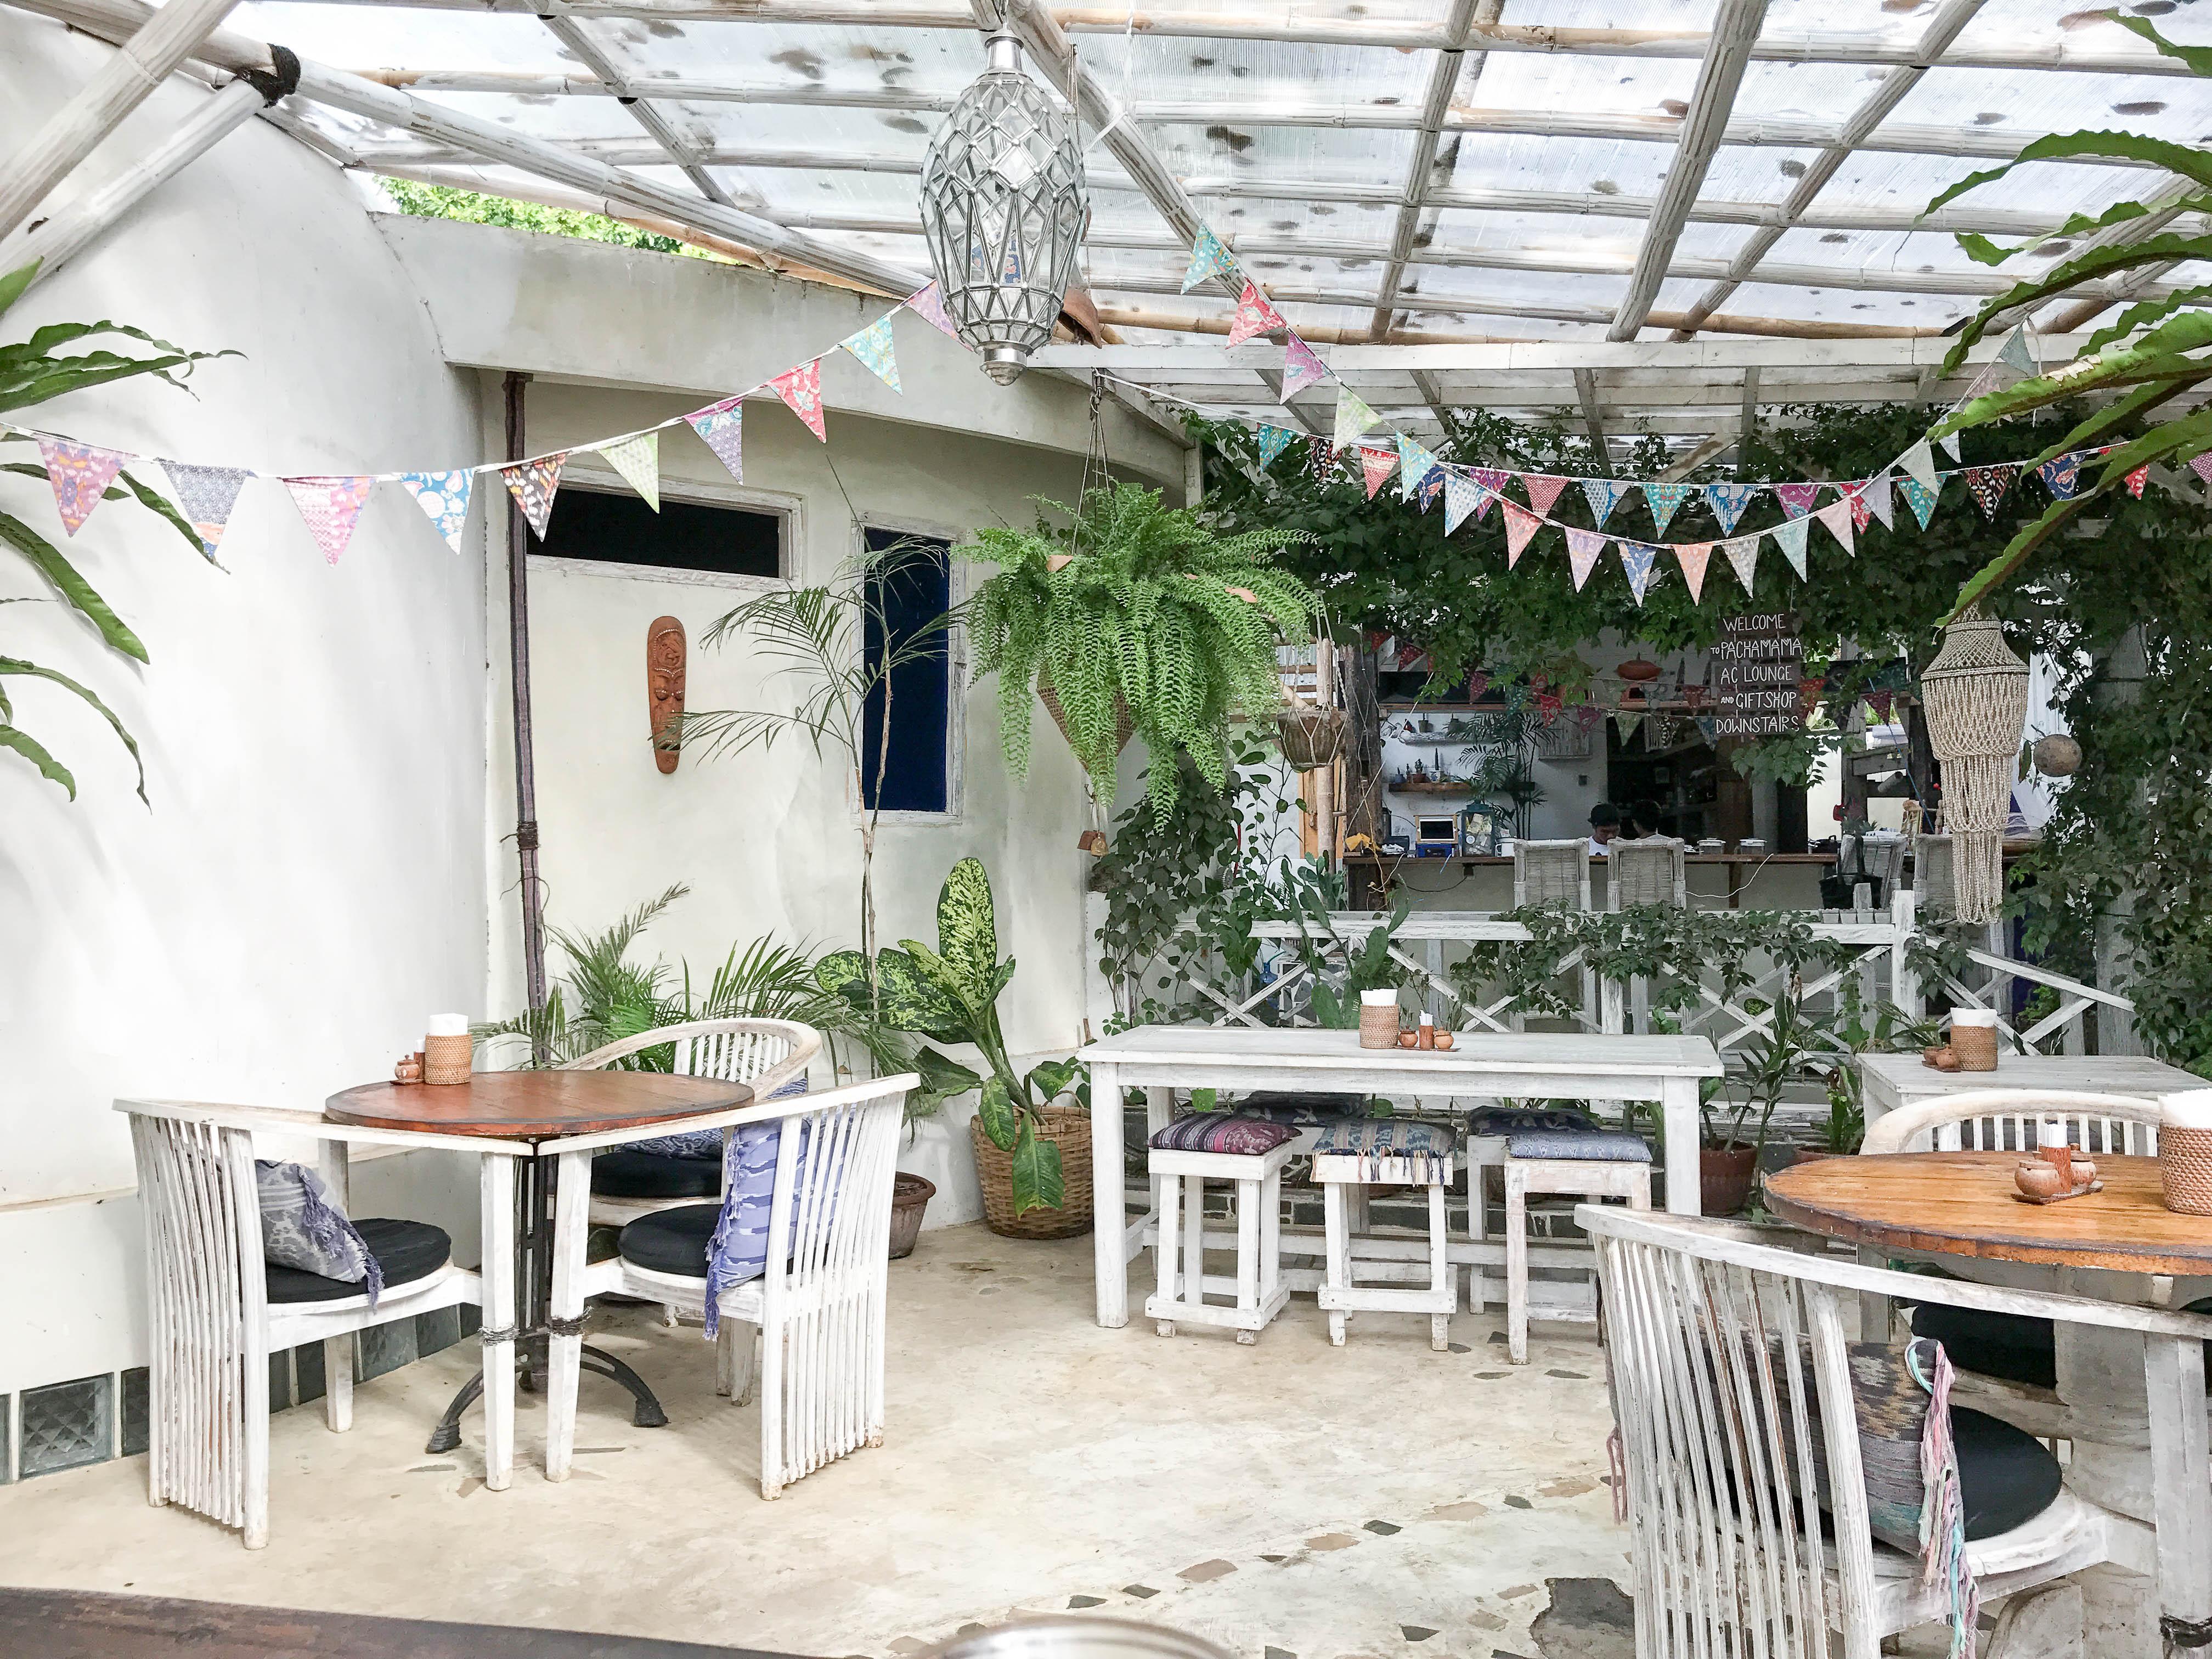 Gili Air - Pachamama Organic Café